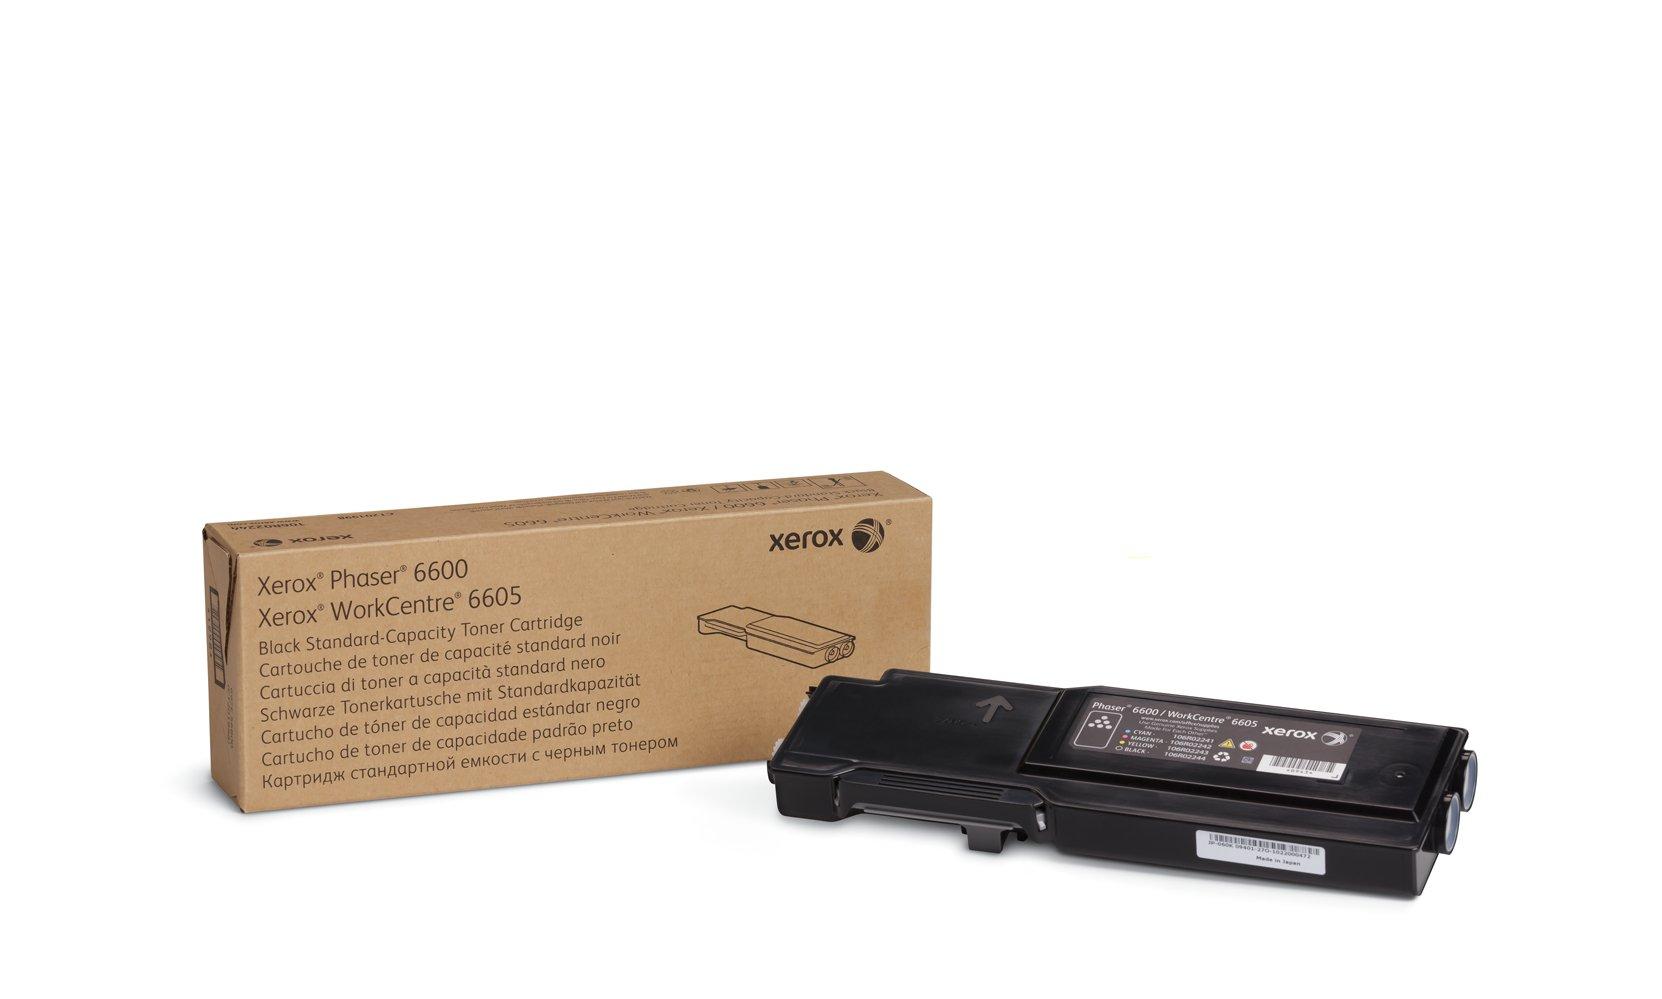 Toner Original XEROX Black para the Phaser 6600 o WorkCentre 6605 106R02244